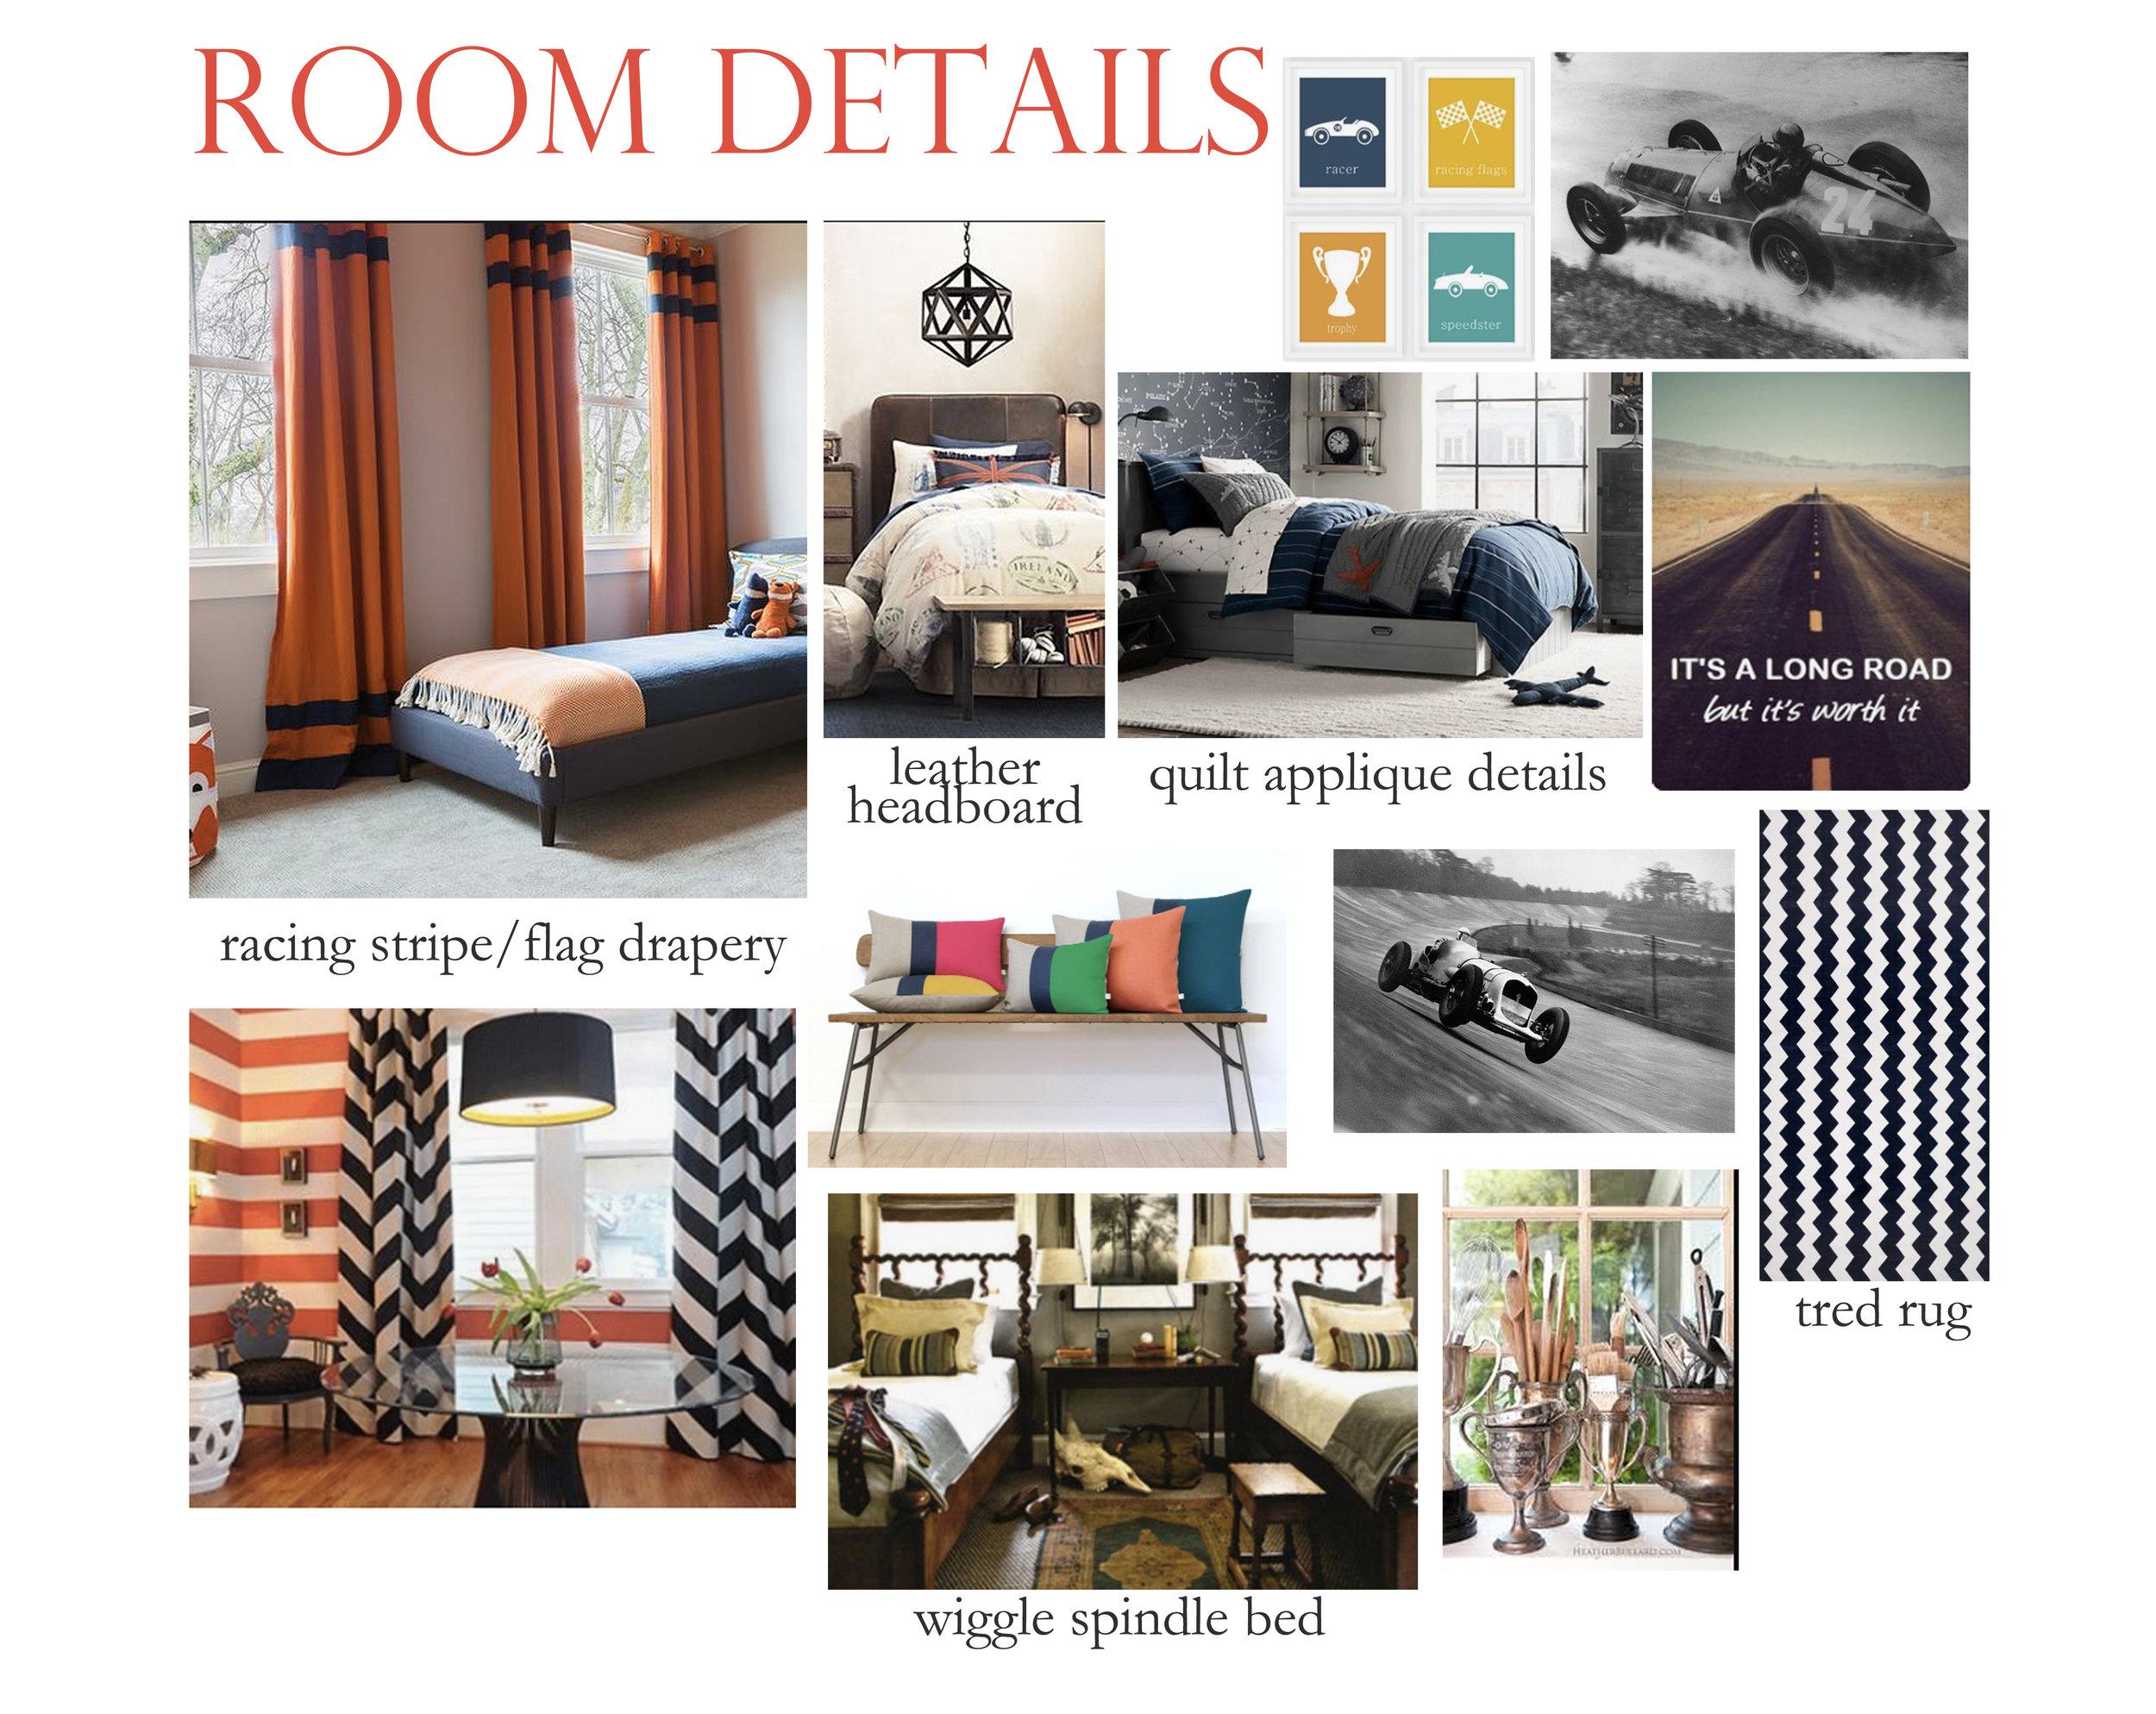 room details_edited-1.jpg